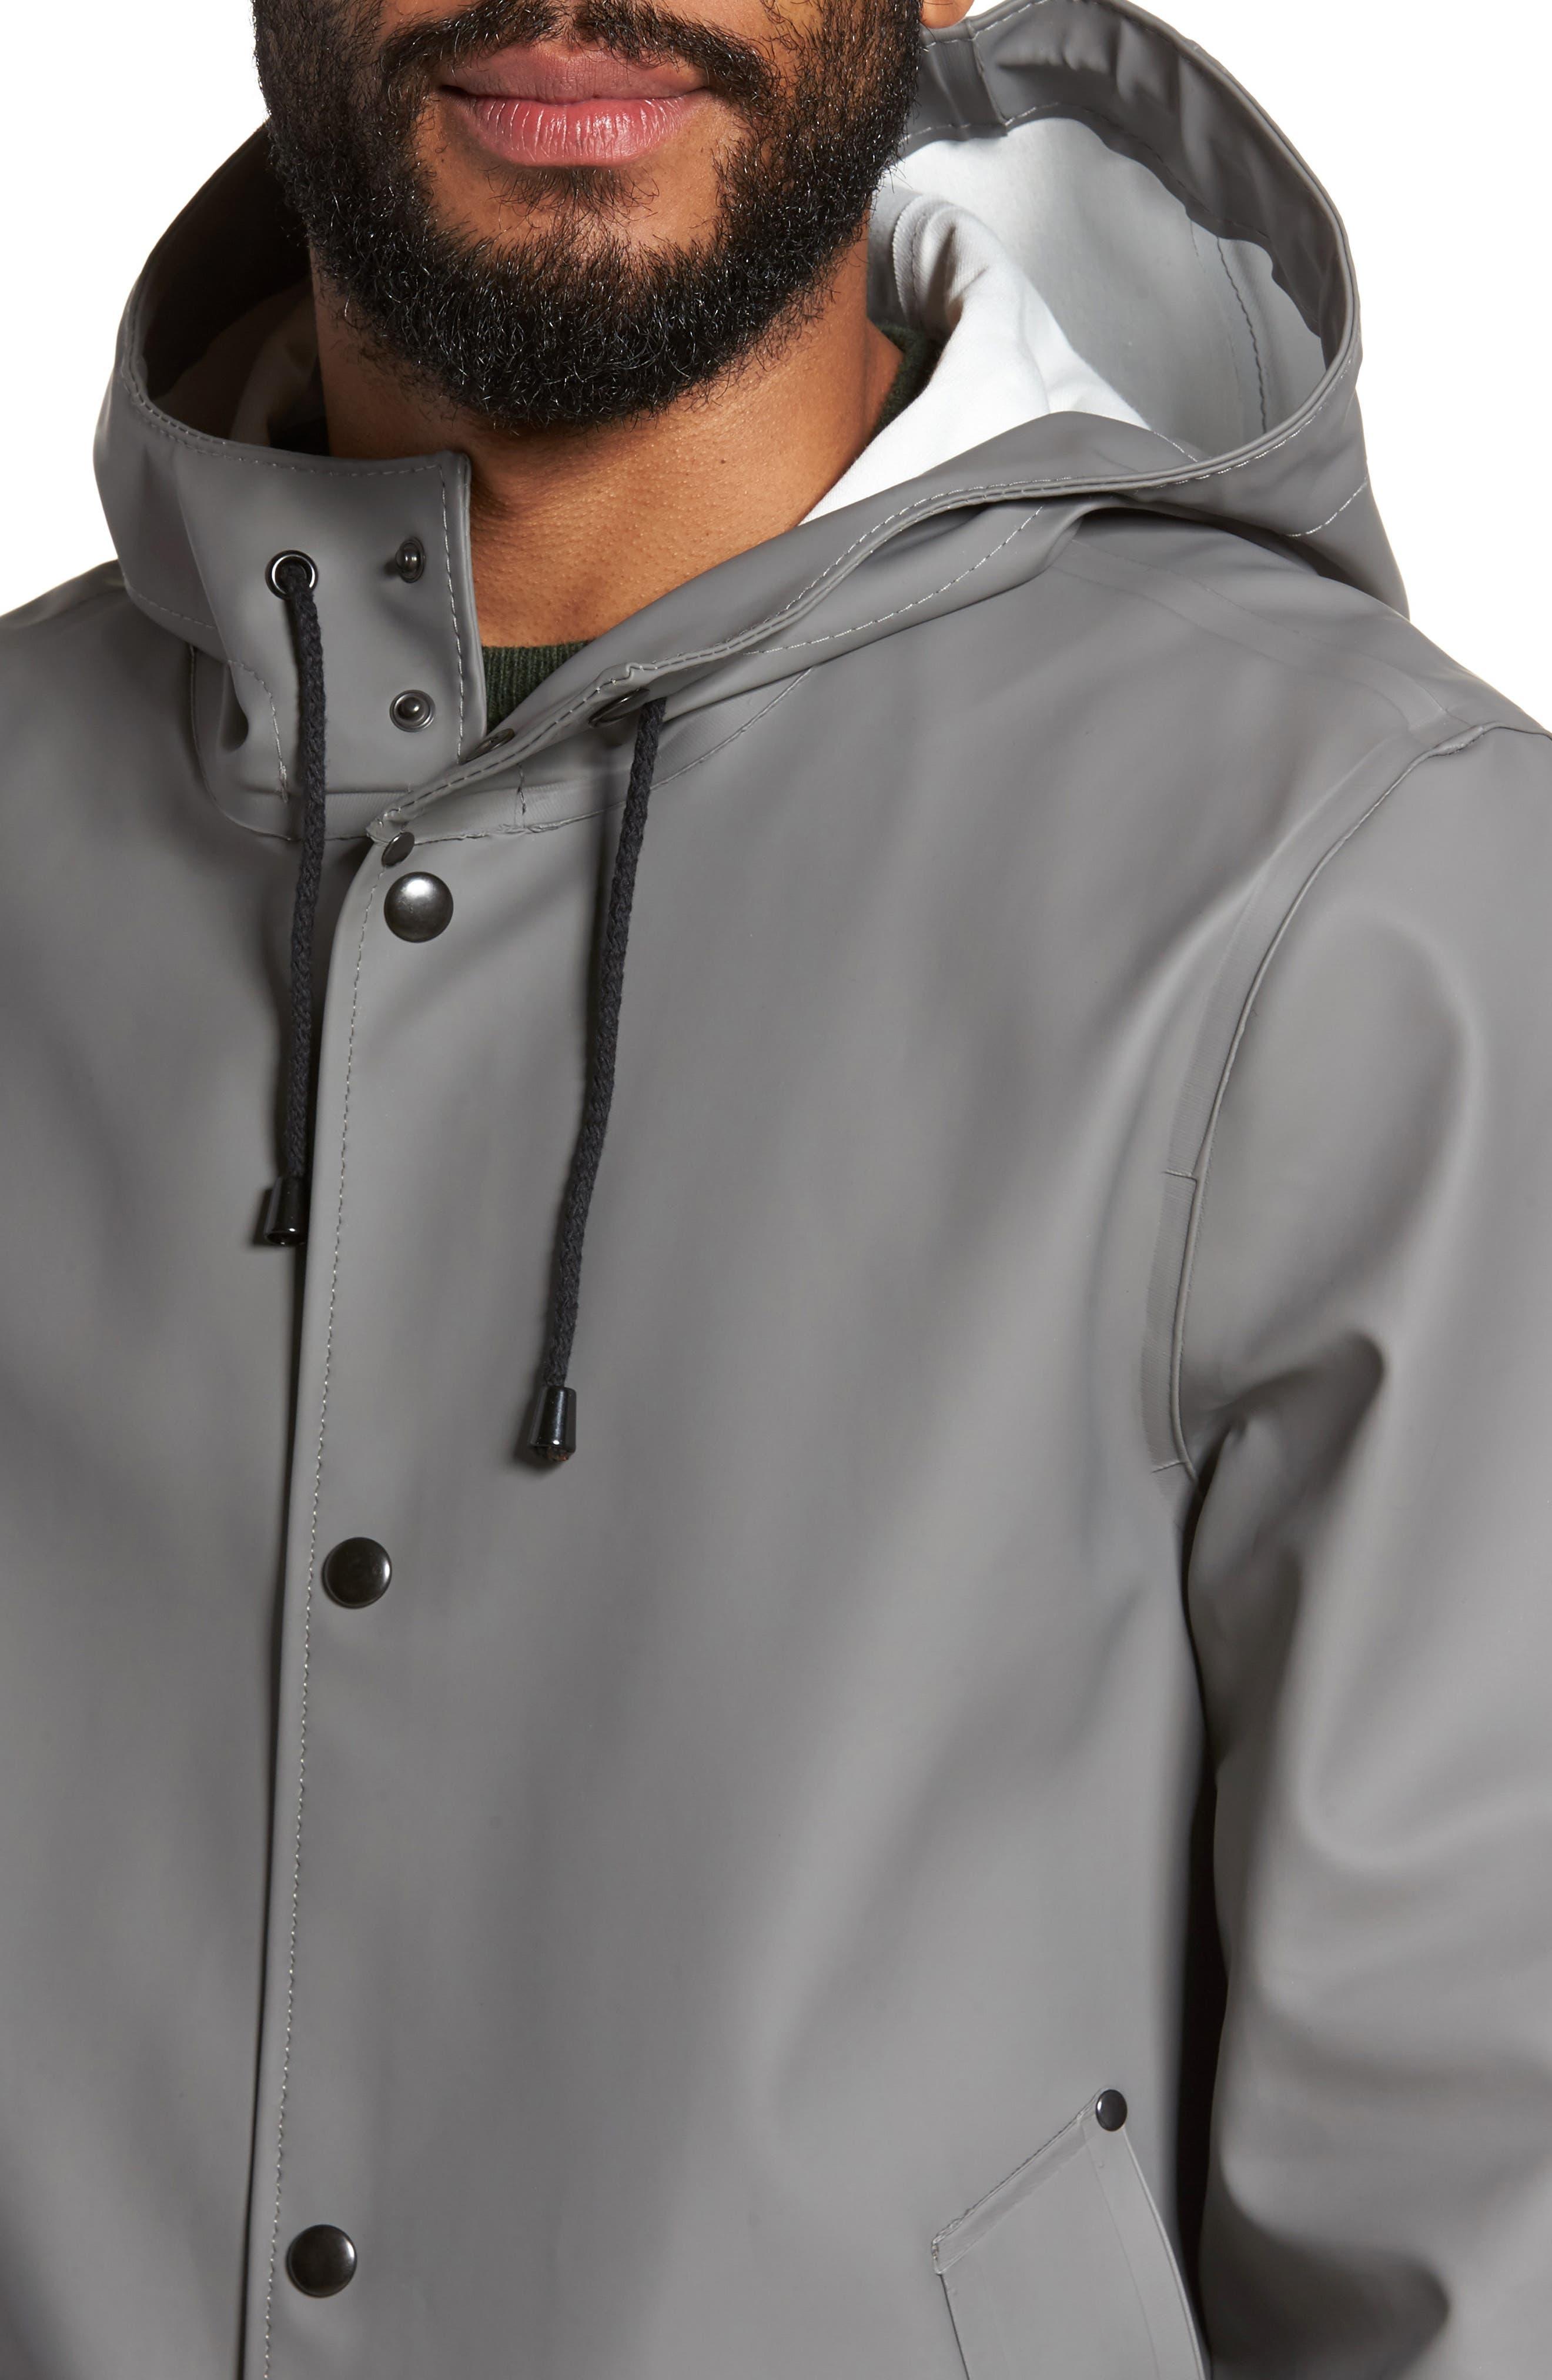 Stockholm Colorblock Waterproof Hooded Raincoat,                             Alternate thumbnail 4, color,                             Grey/ Green